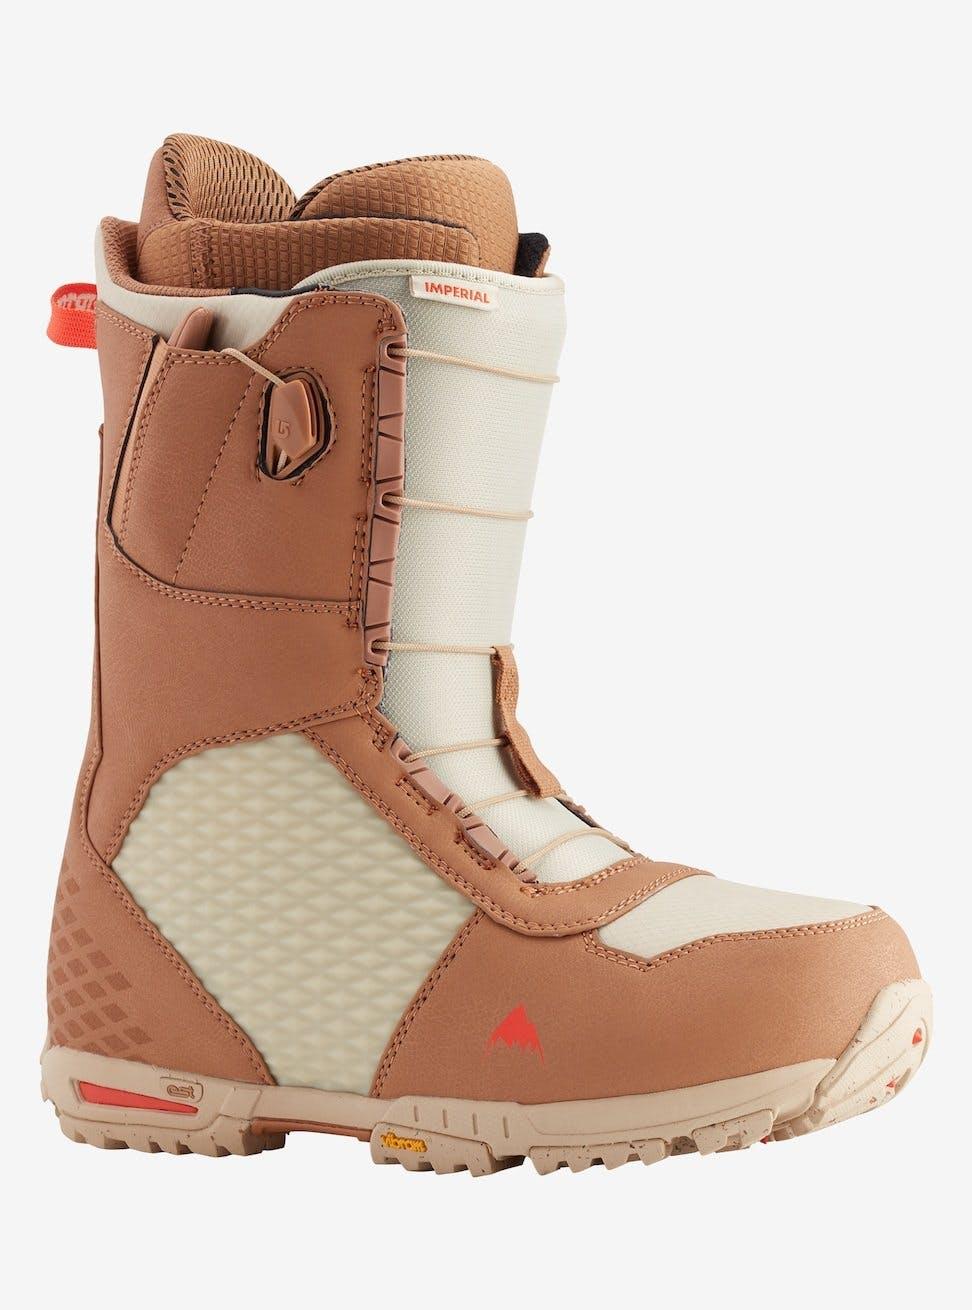 Burton Imperial Snowboard Boots · 2021